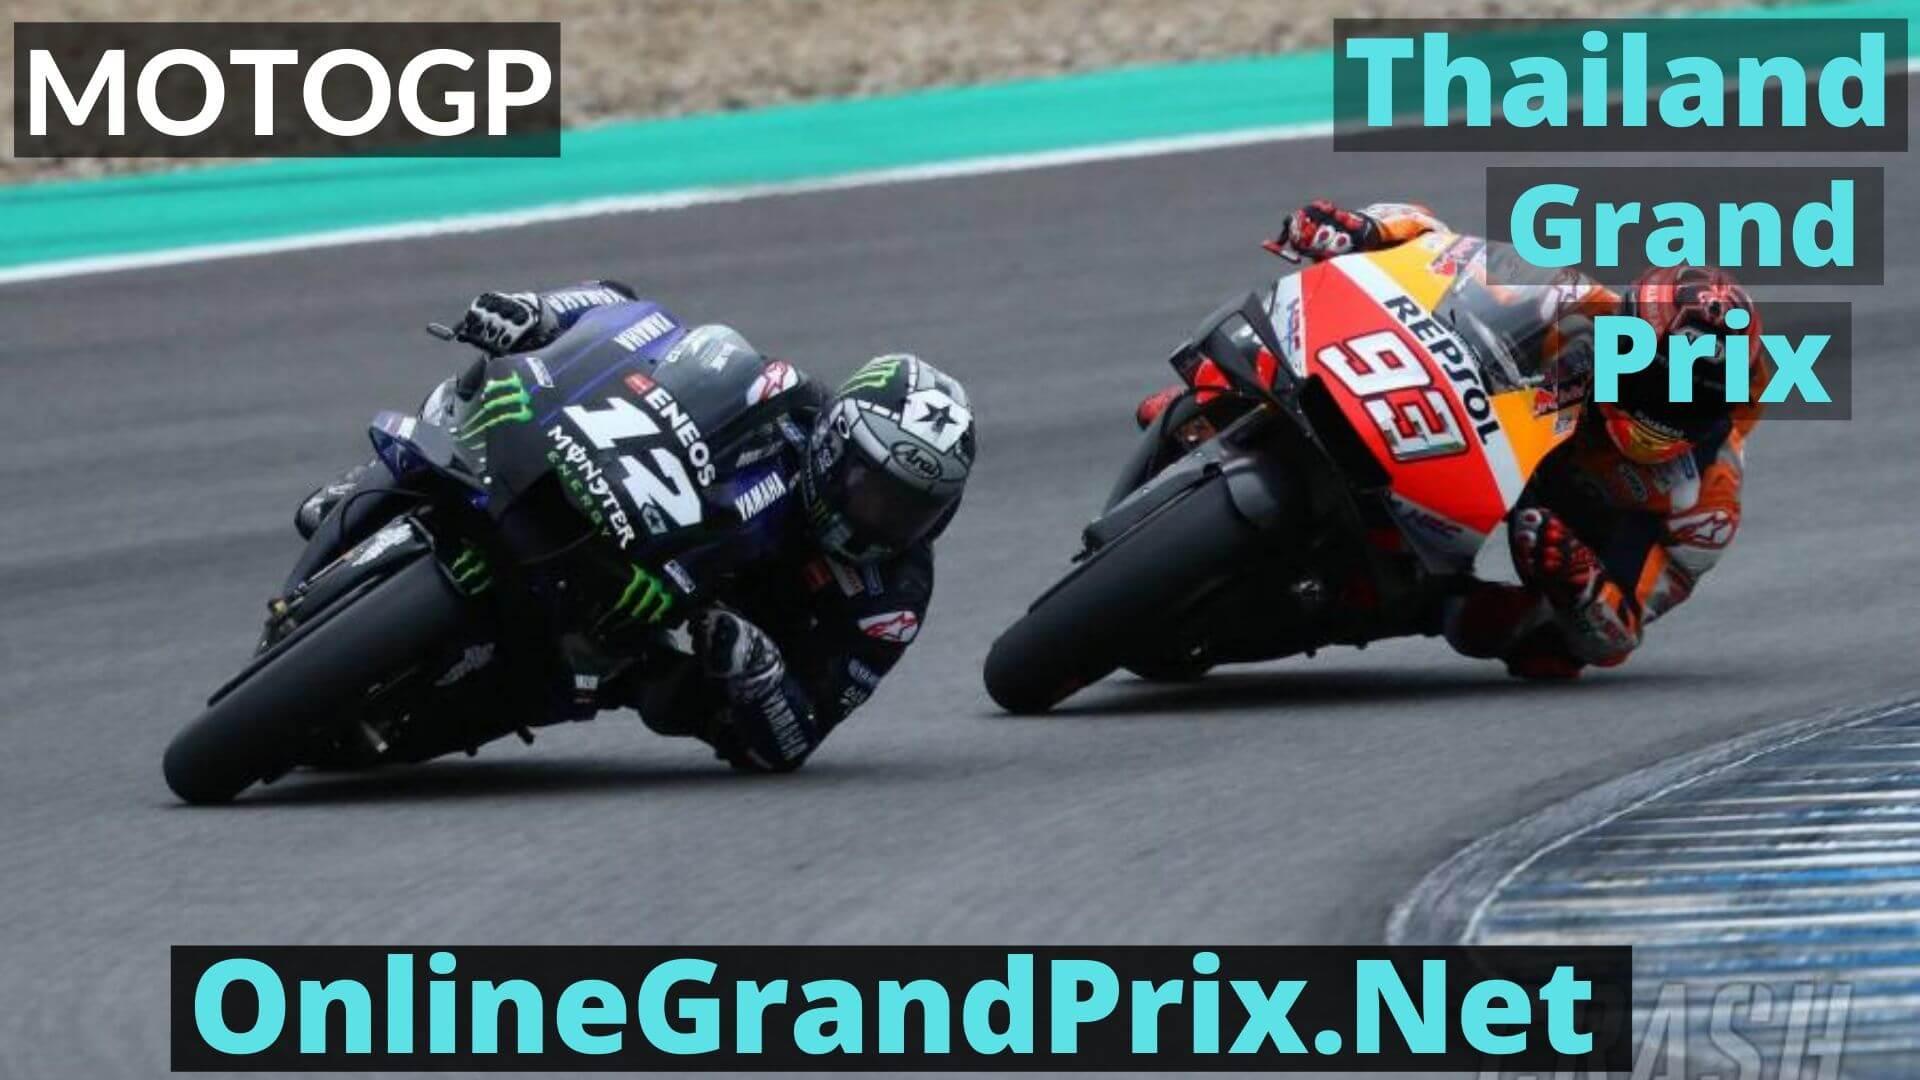 Thailand Grand Prix Live Stream 2020 | MotoGP